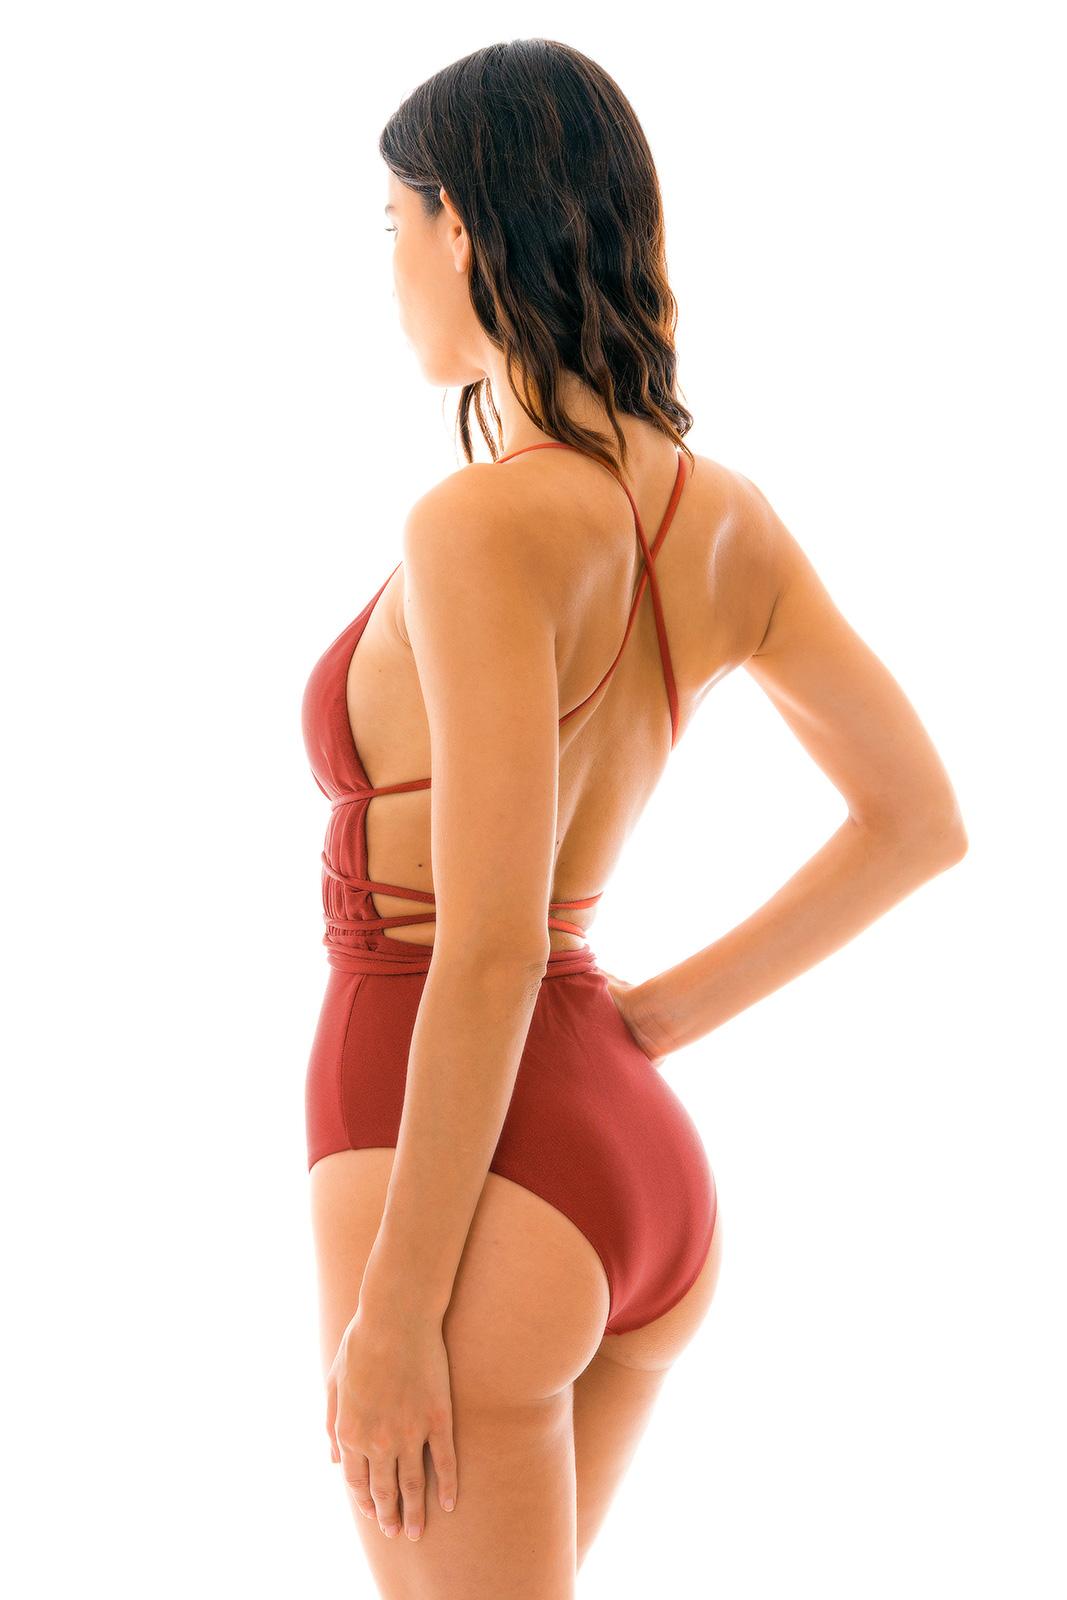 f7363539c76e Burgundy Plunging One-piece Swimsuit - Liquor New Vegas - Rio de Sol